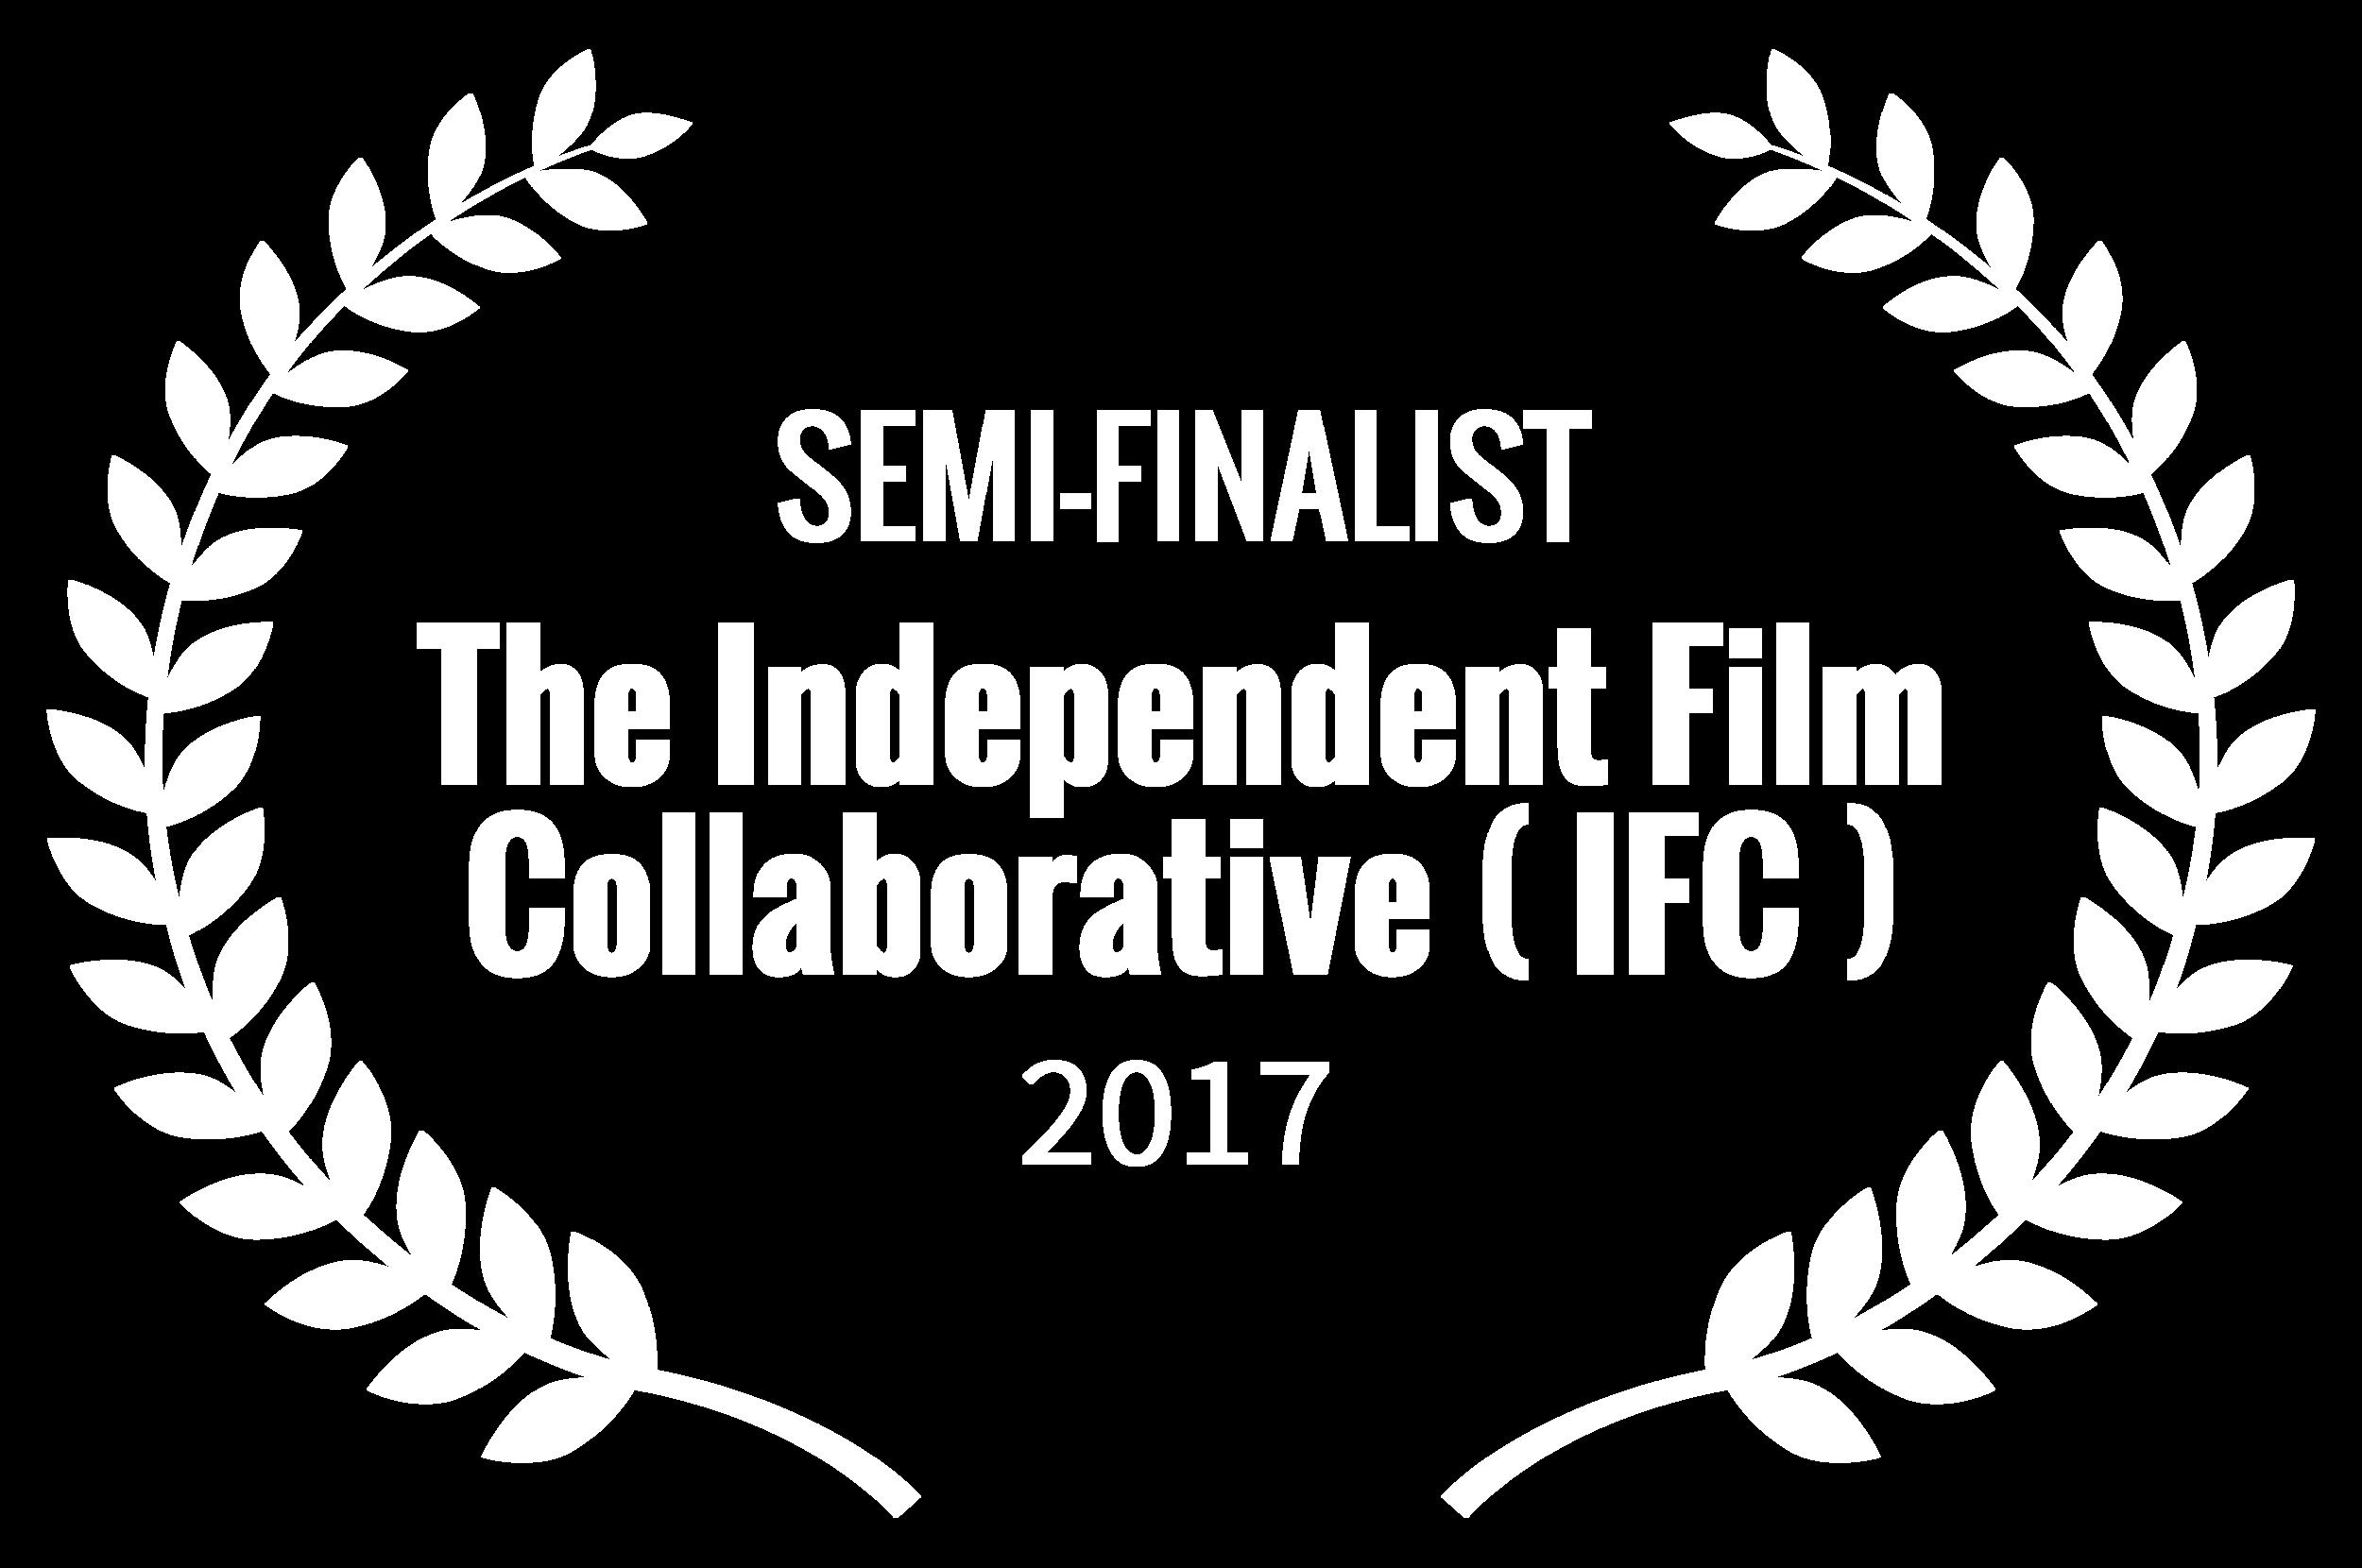 SEMI-FINALIST-TheIndependentFilmCollaborativeIFC-2017.png